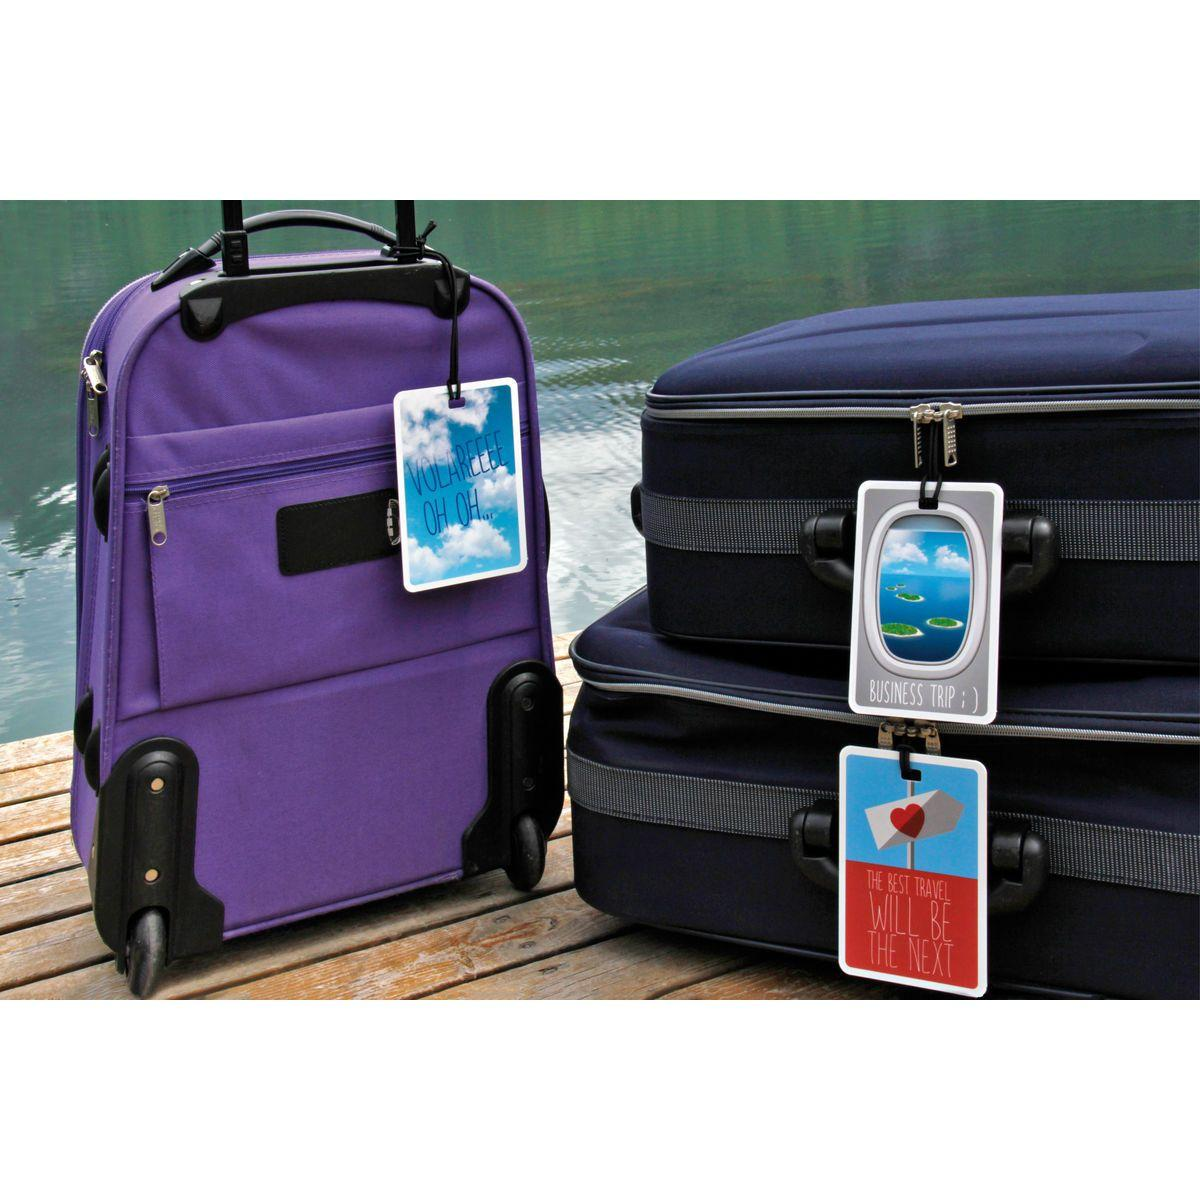 Set valige su pontile con etichette #MYTAG